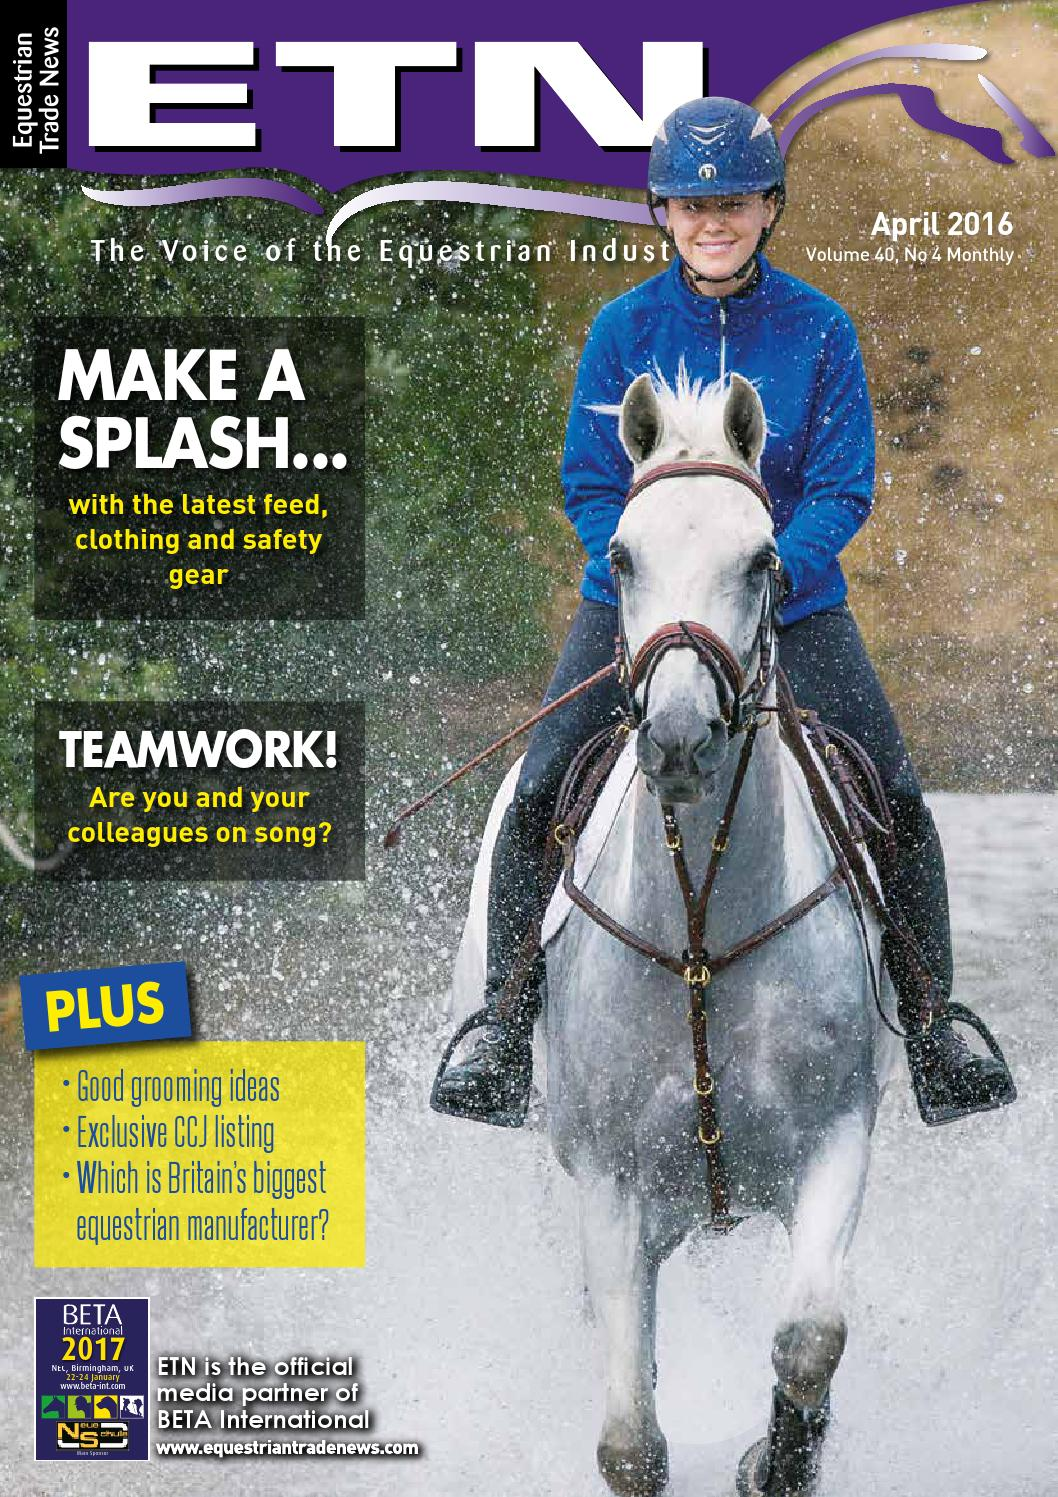 740f3f49f5bc9 ETN - Equestrian Trade News - April 2016 by ETN (Equestrian Trade News) -  issuu